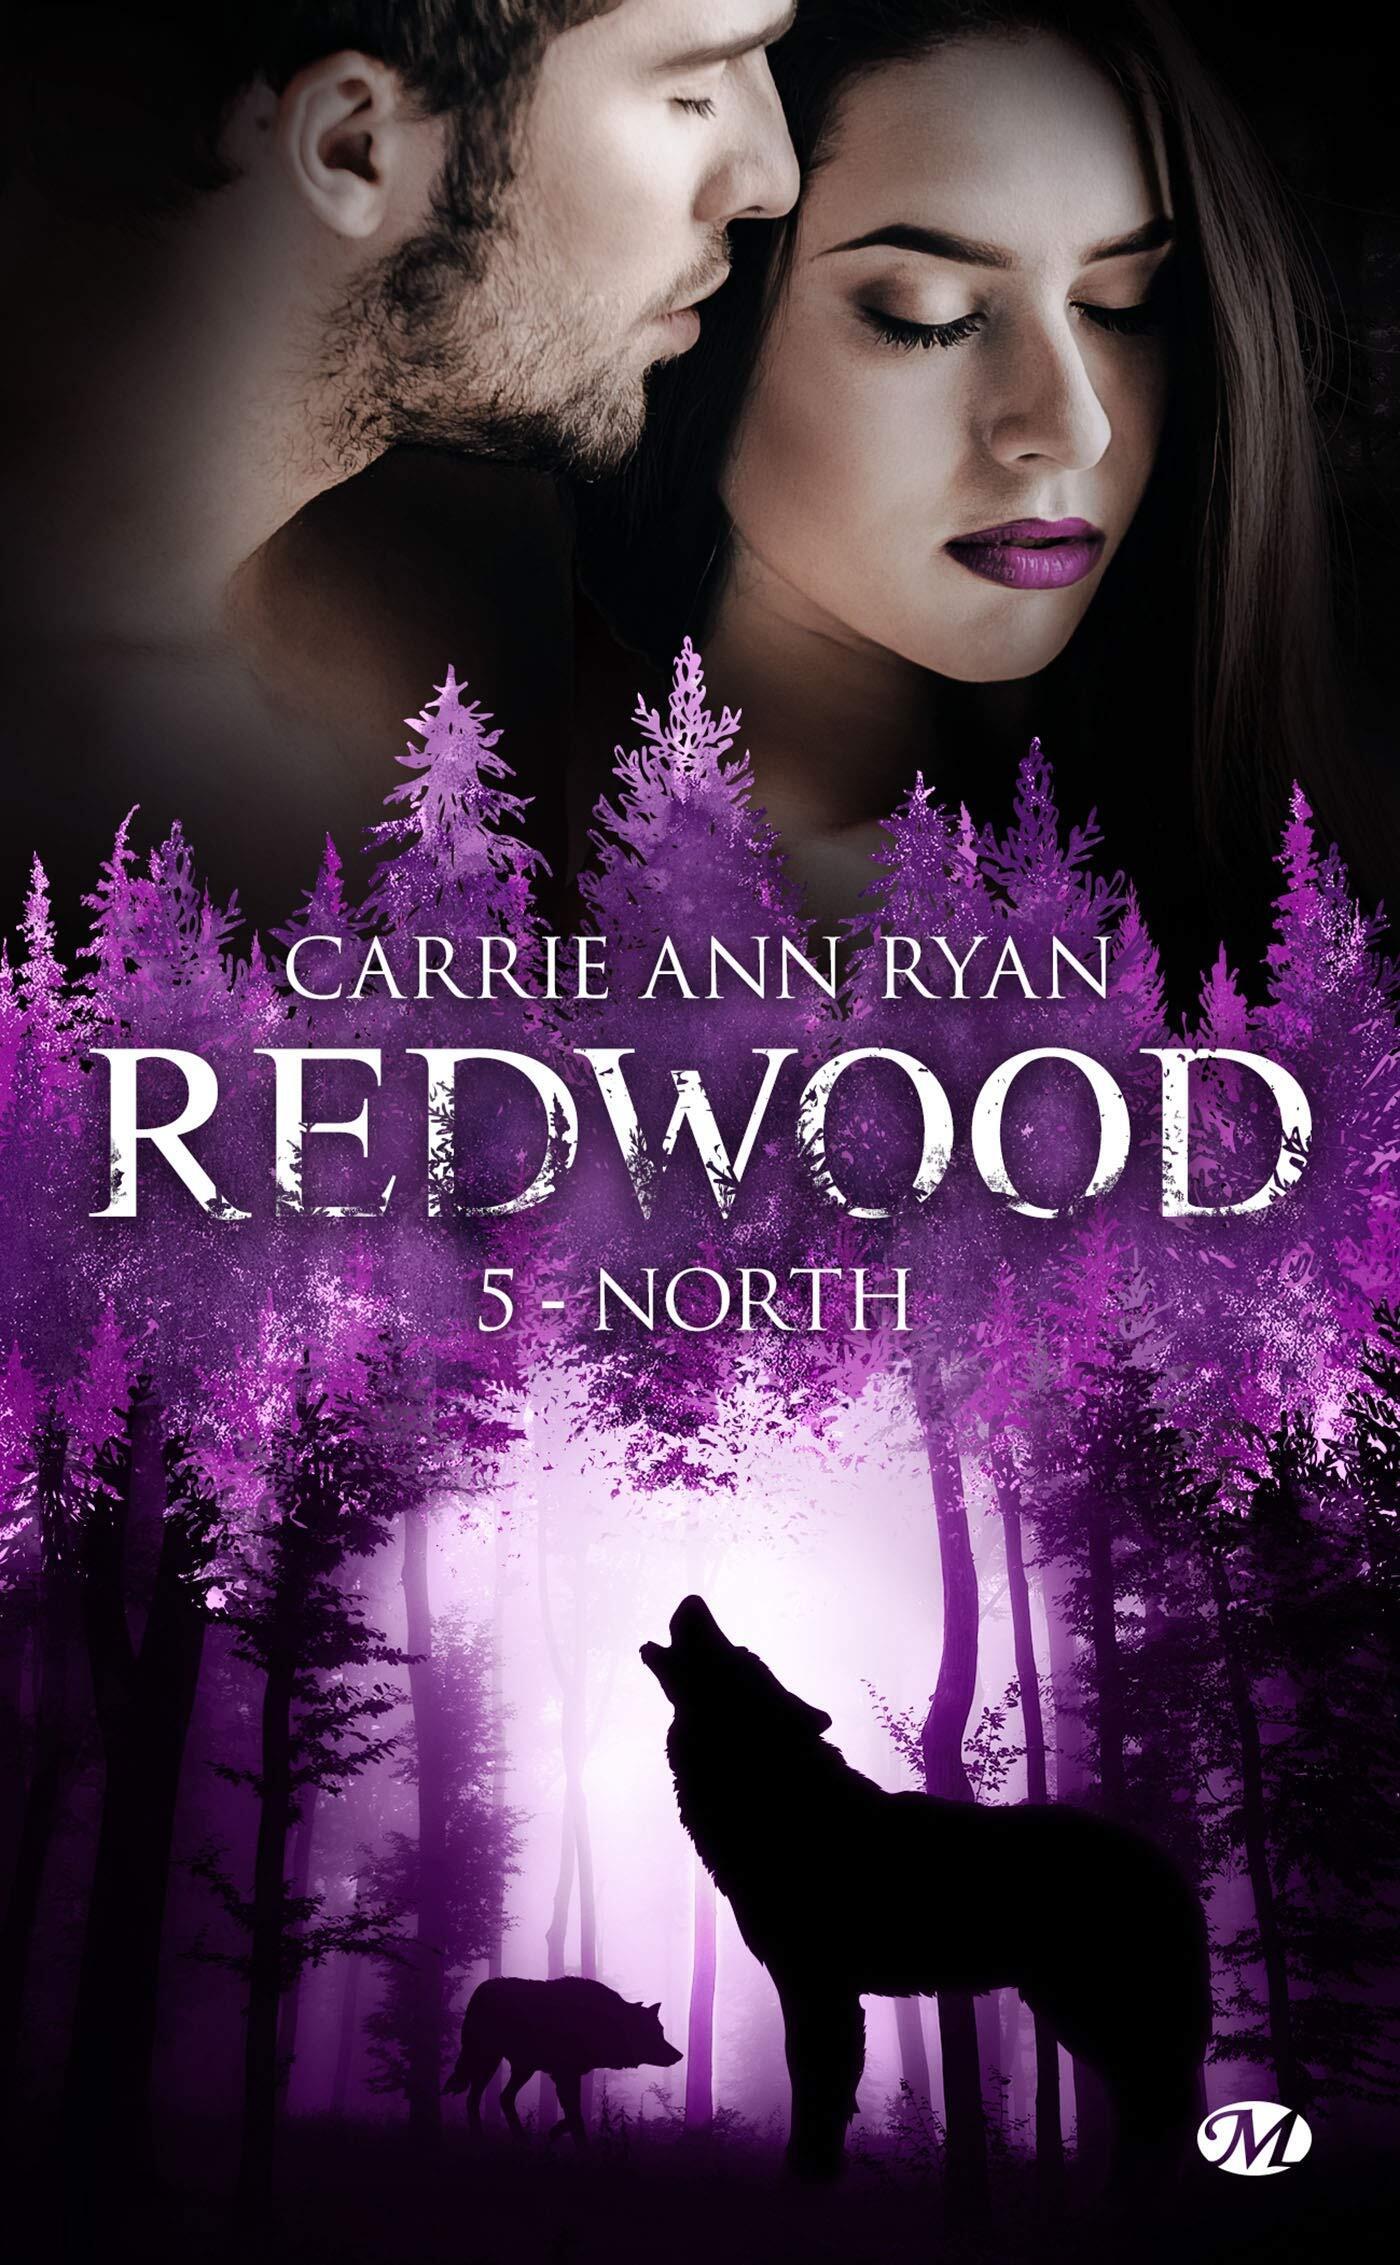 cdn1.booknode.com/book_cover/1291/full/redwood-tome-5-north-1291015.jpg